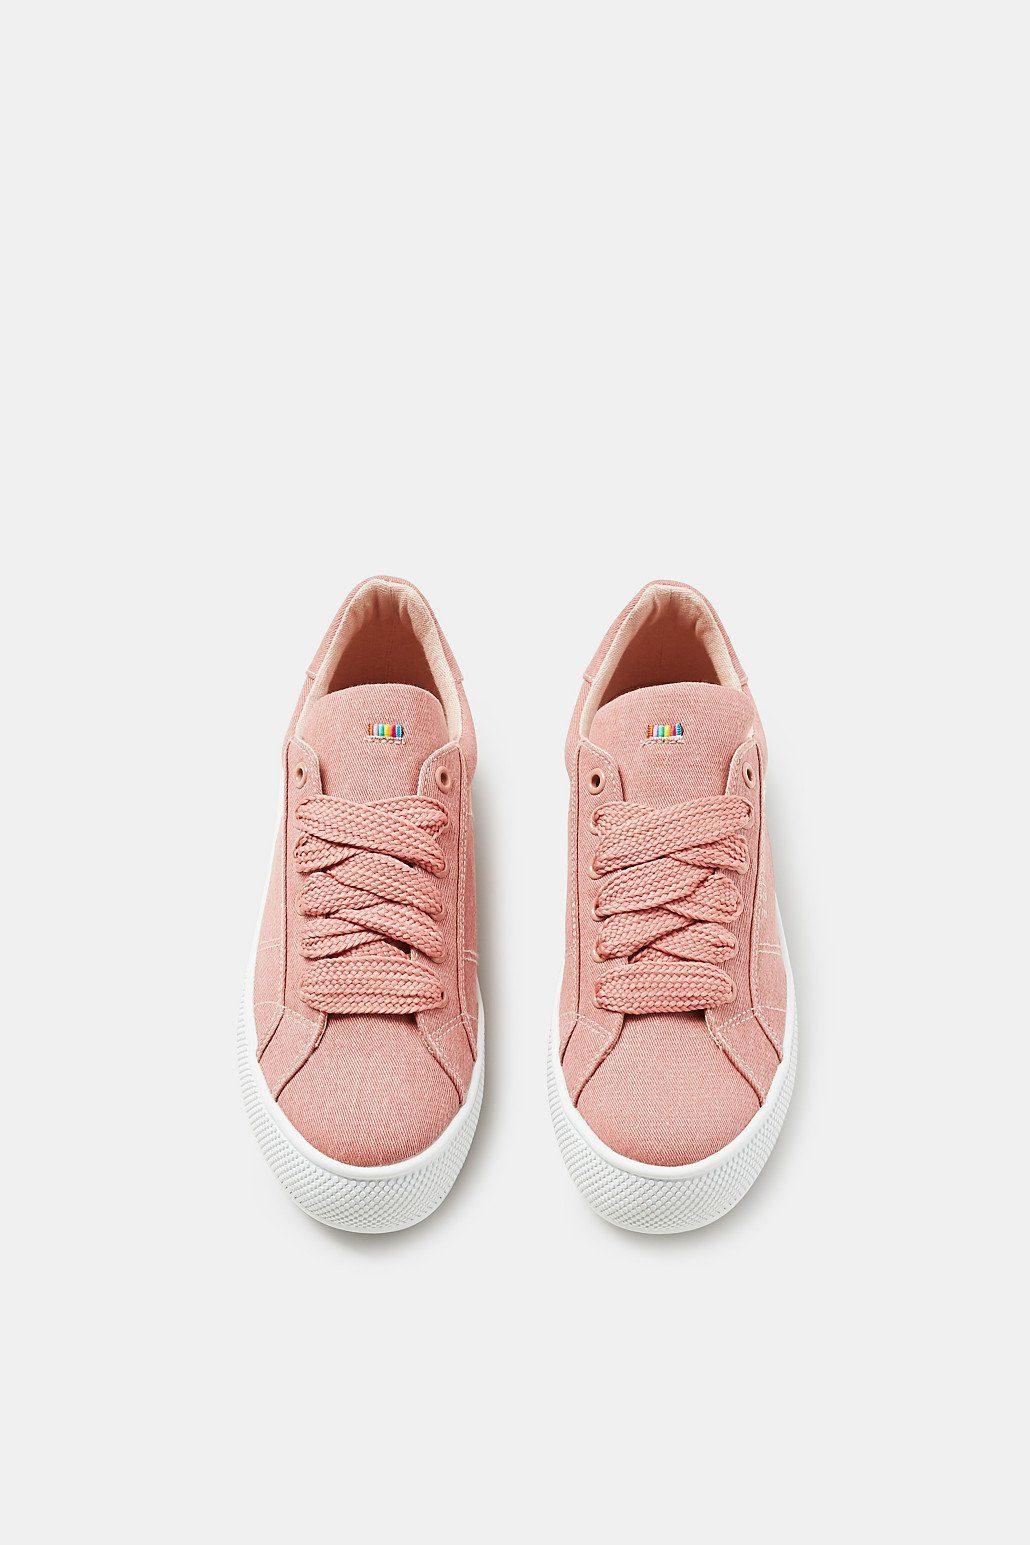 ESPRIT Plateau-Sneaker in Denim-Optik kaufen  OLD PINK